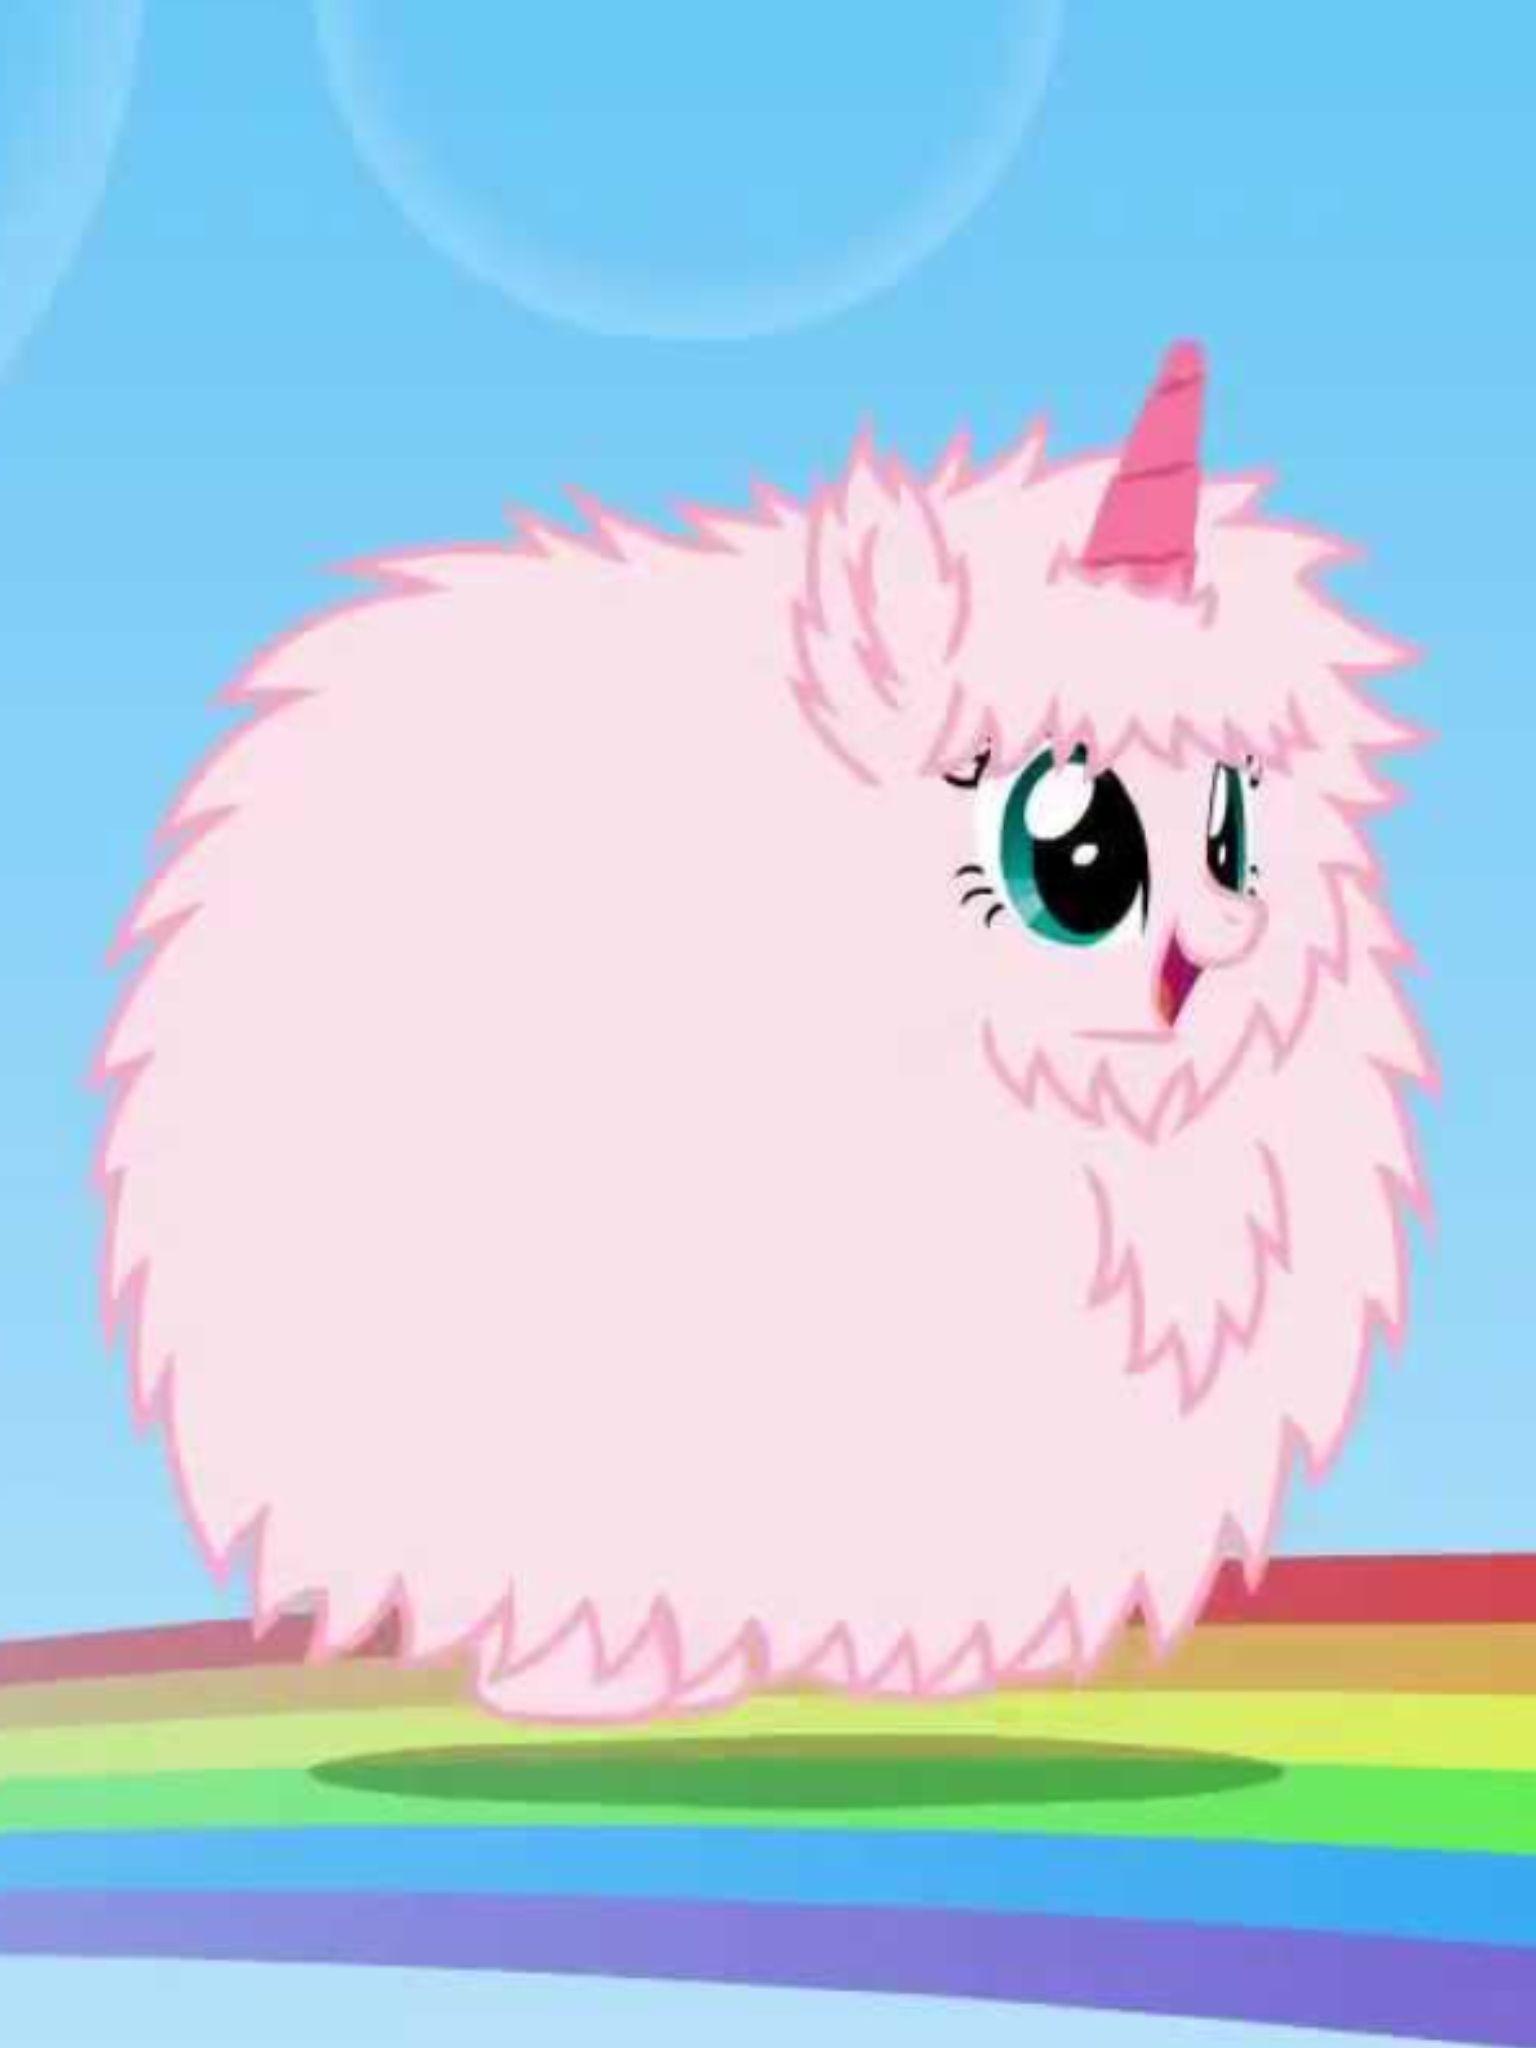 Pink Fluffy Unicorns Dancing On Rainbow Wallpapers